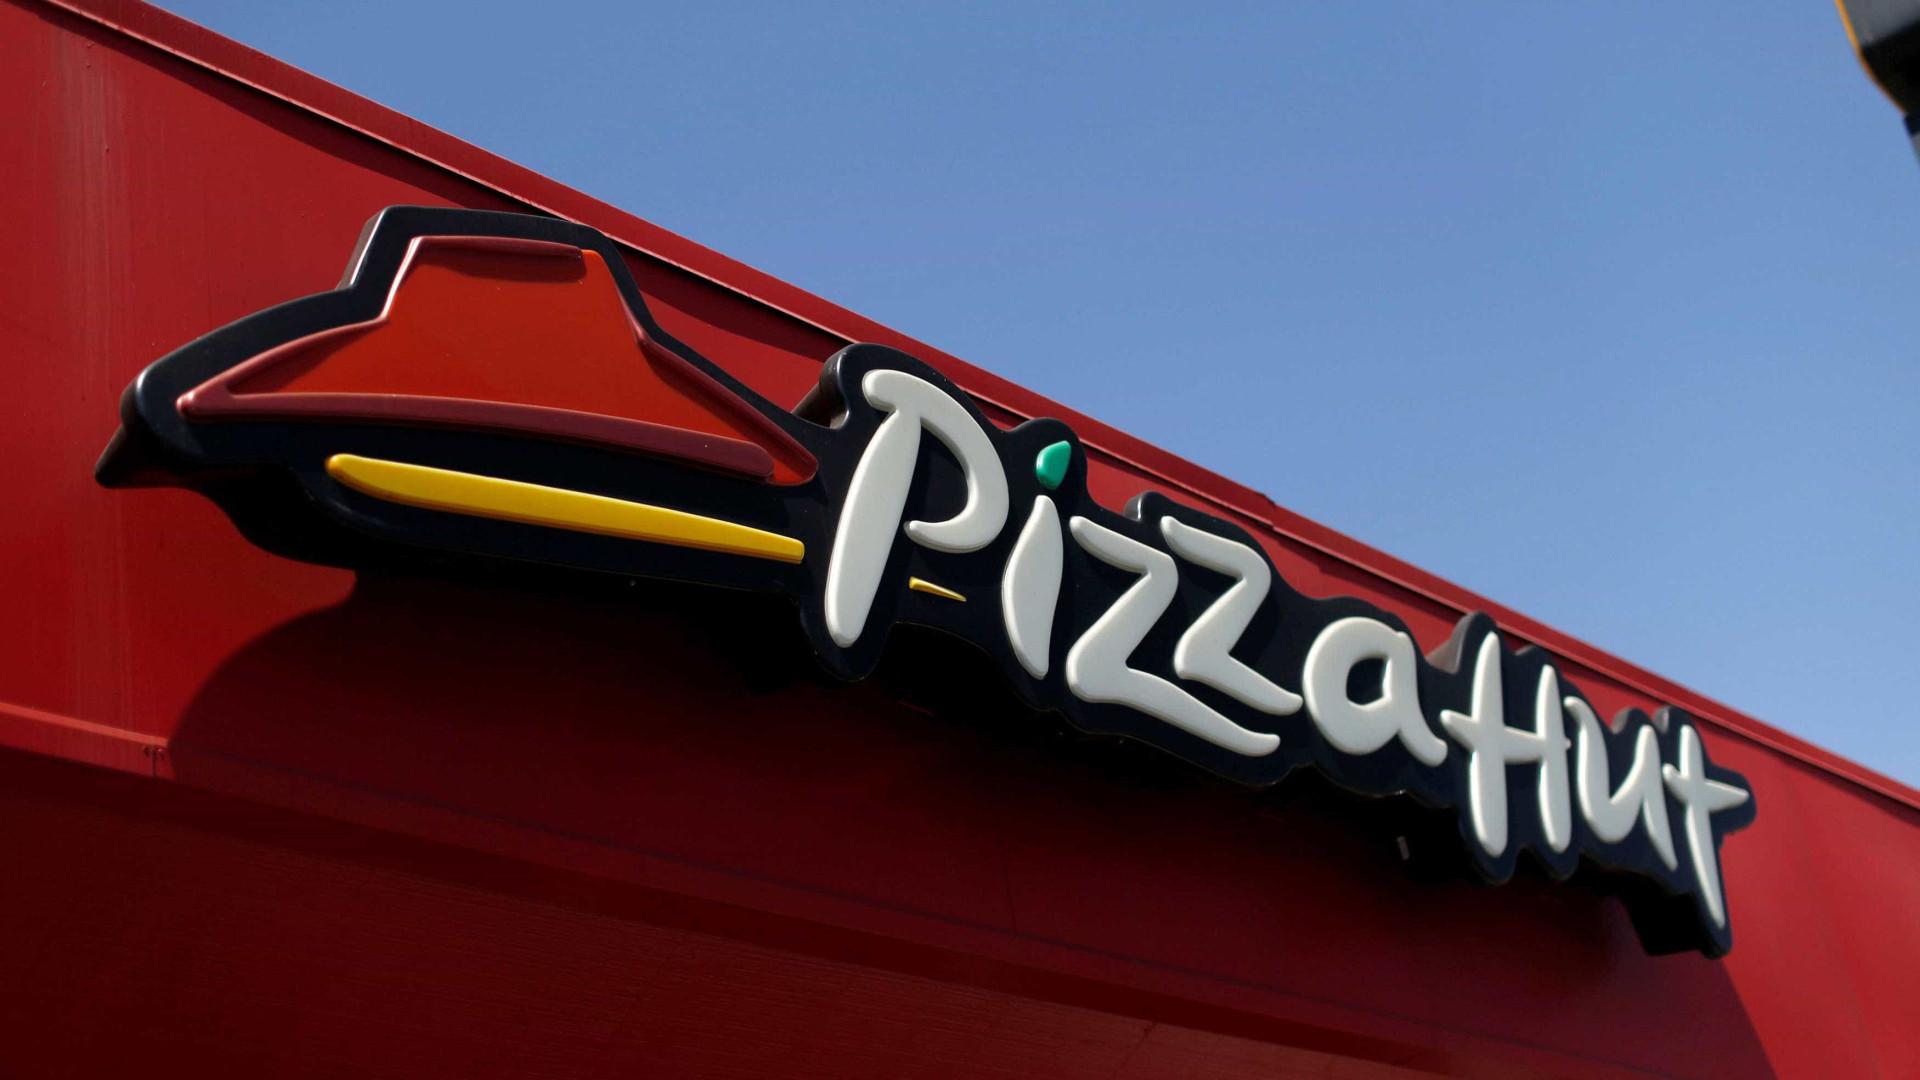 Pizza Hut apresenta carro para entrega sem motorista; veja modelo